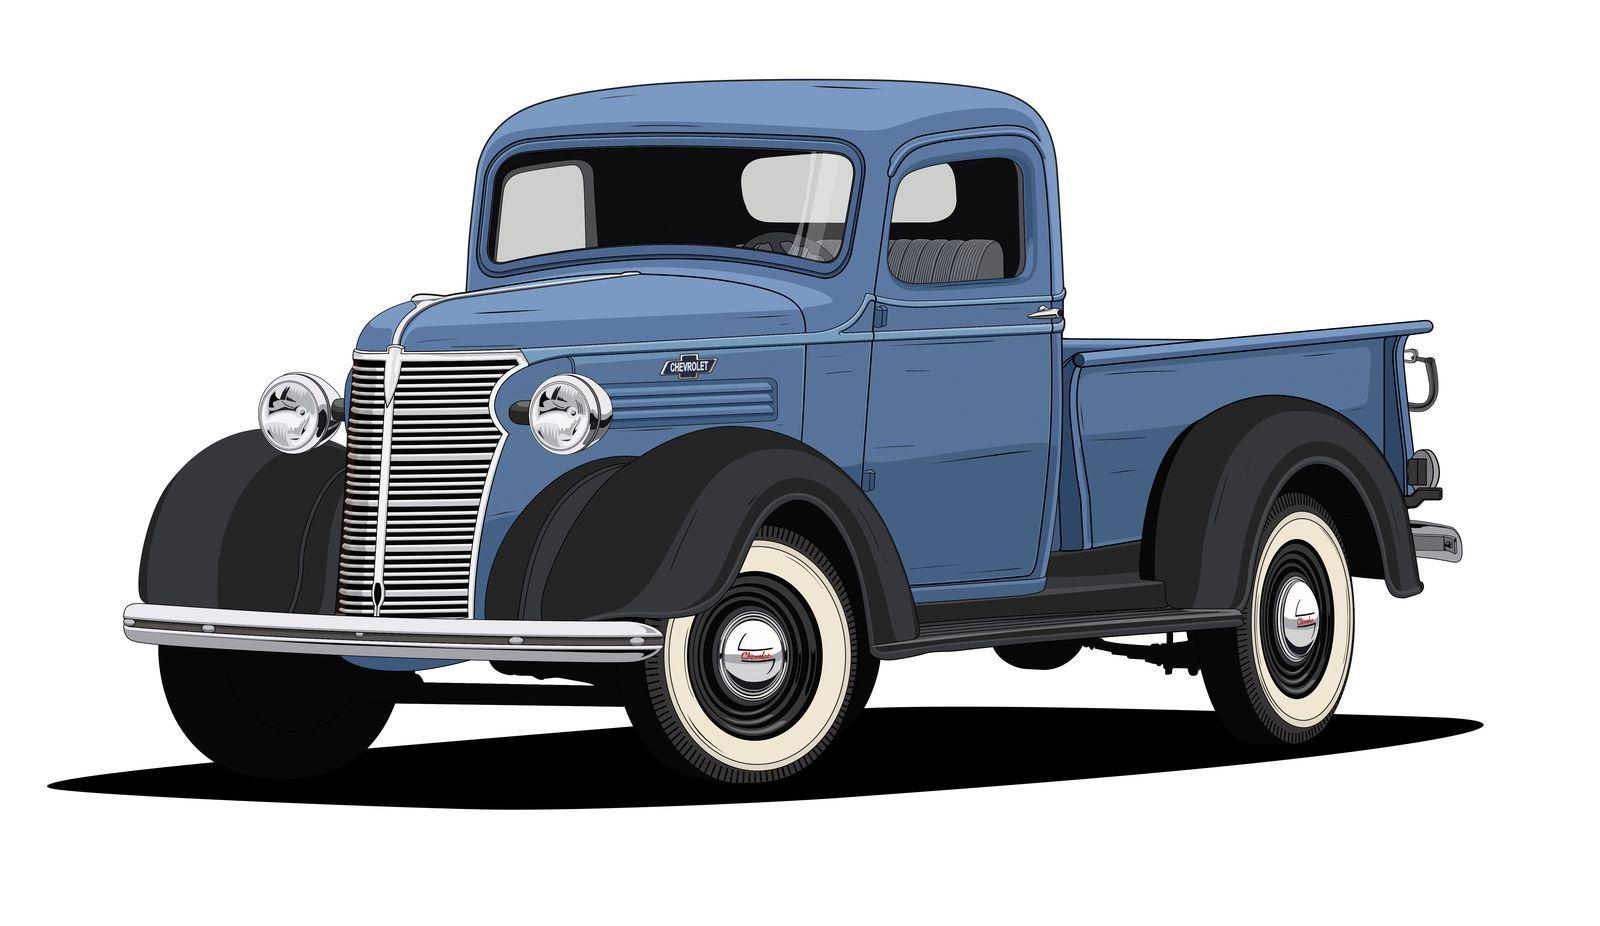 1938 Chevrolet Half Ton | Old Rides 6 | Pinterest | Chevrolet ...